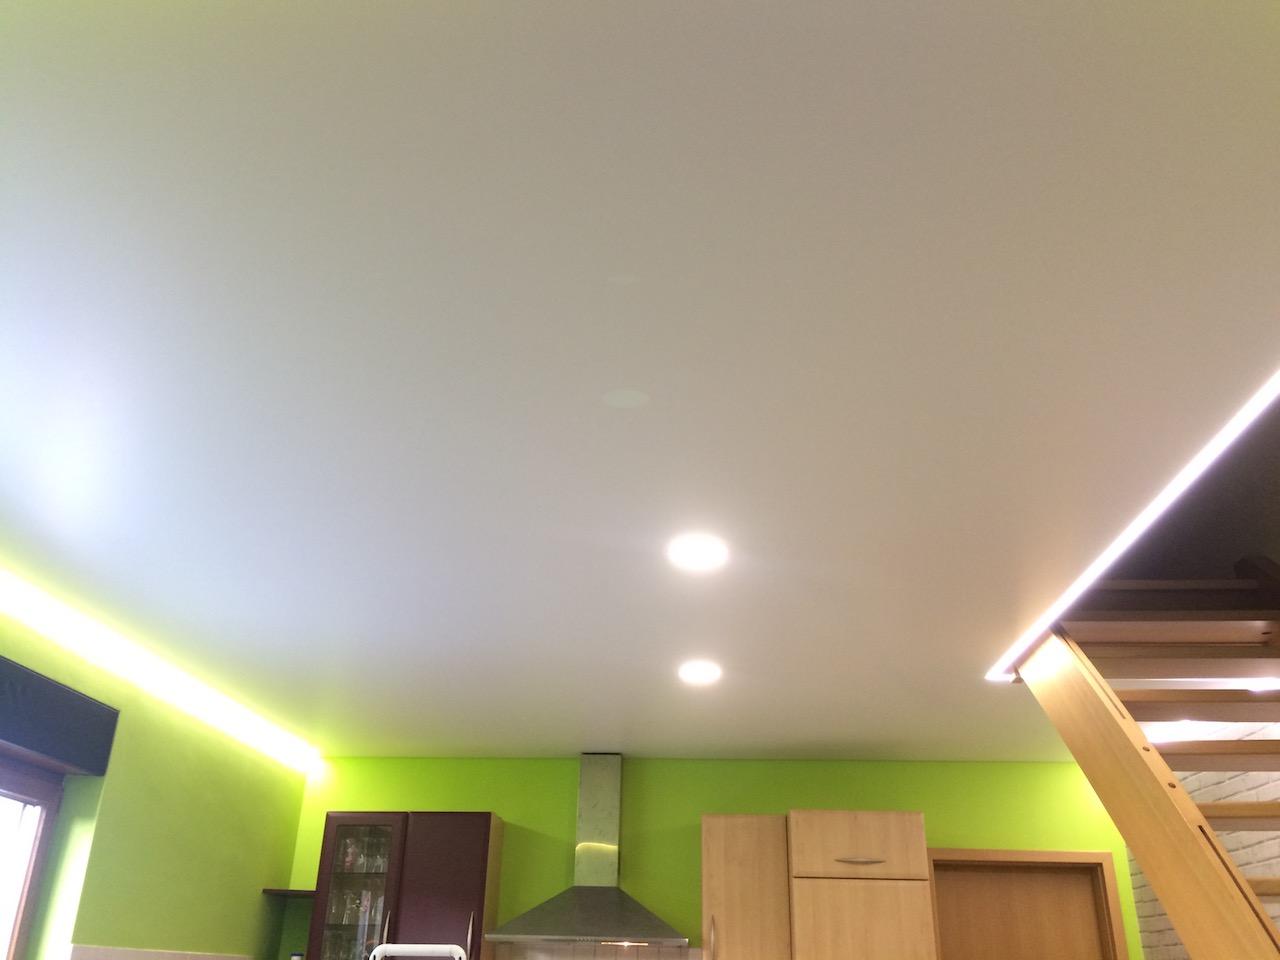 plafond tendu satin magstatt le bas francis collin d co. Black Bedroom Furniture Sets. Home Design Ideas